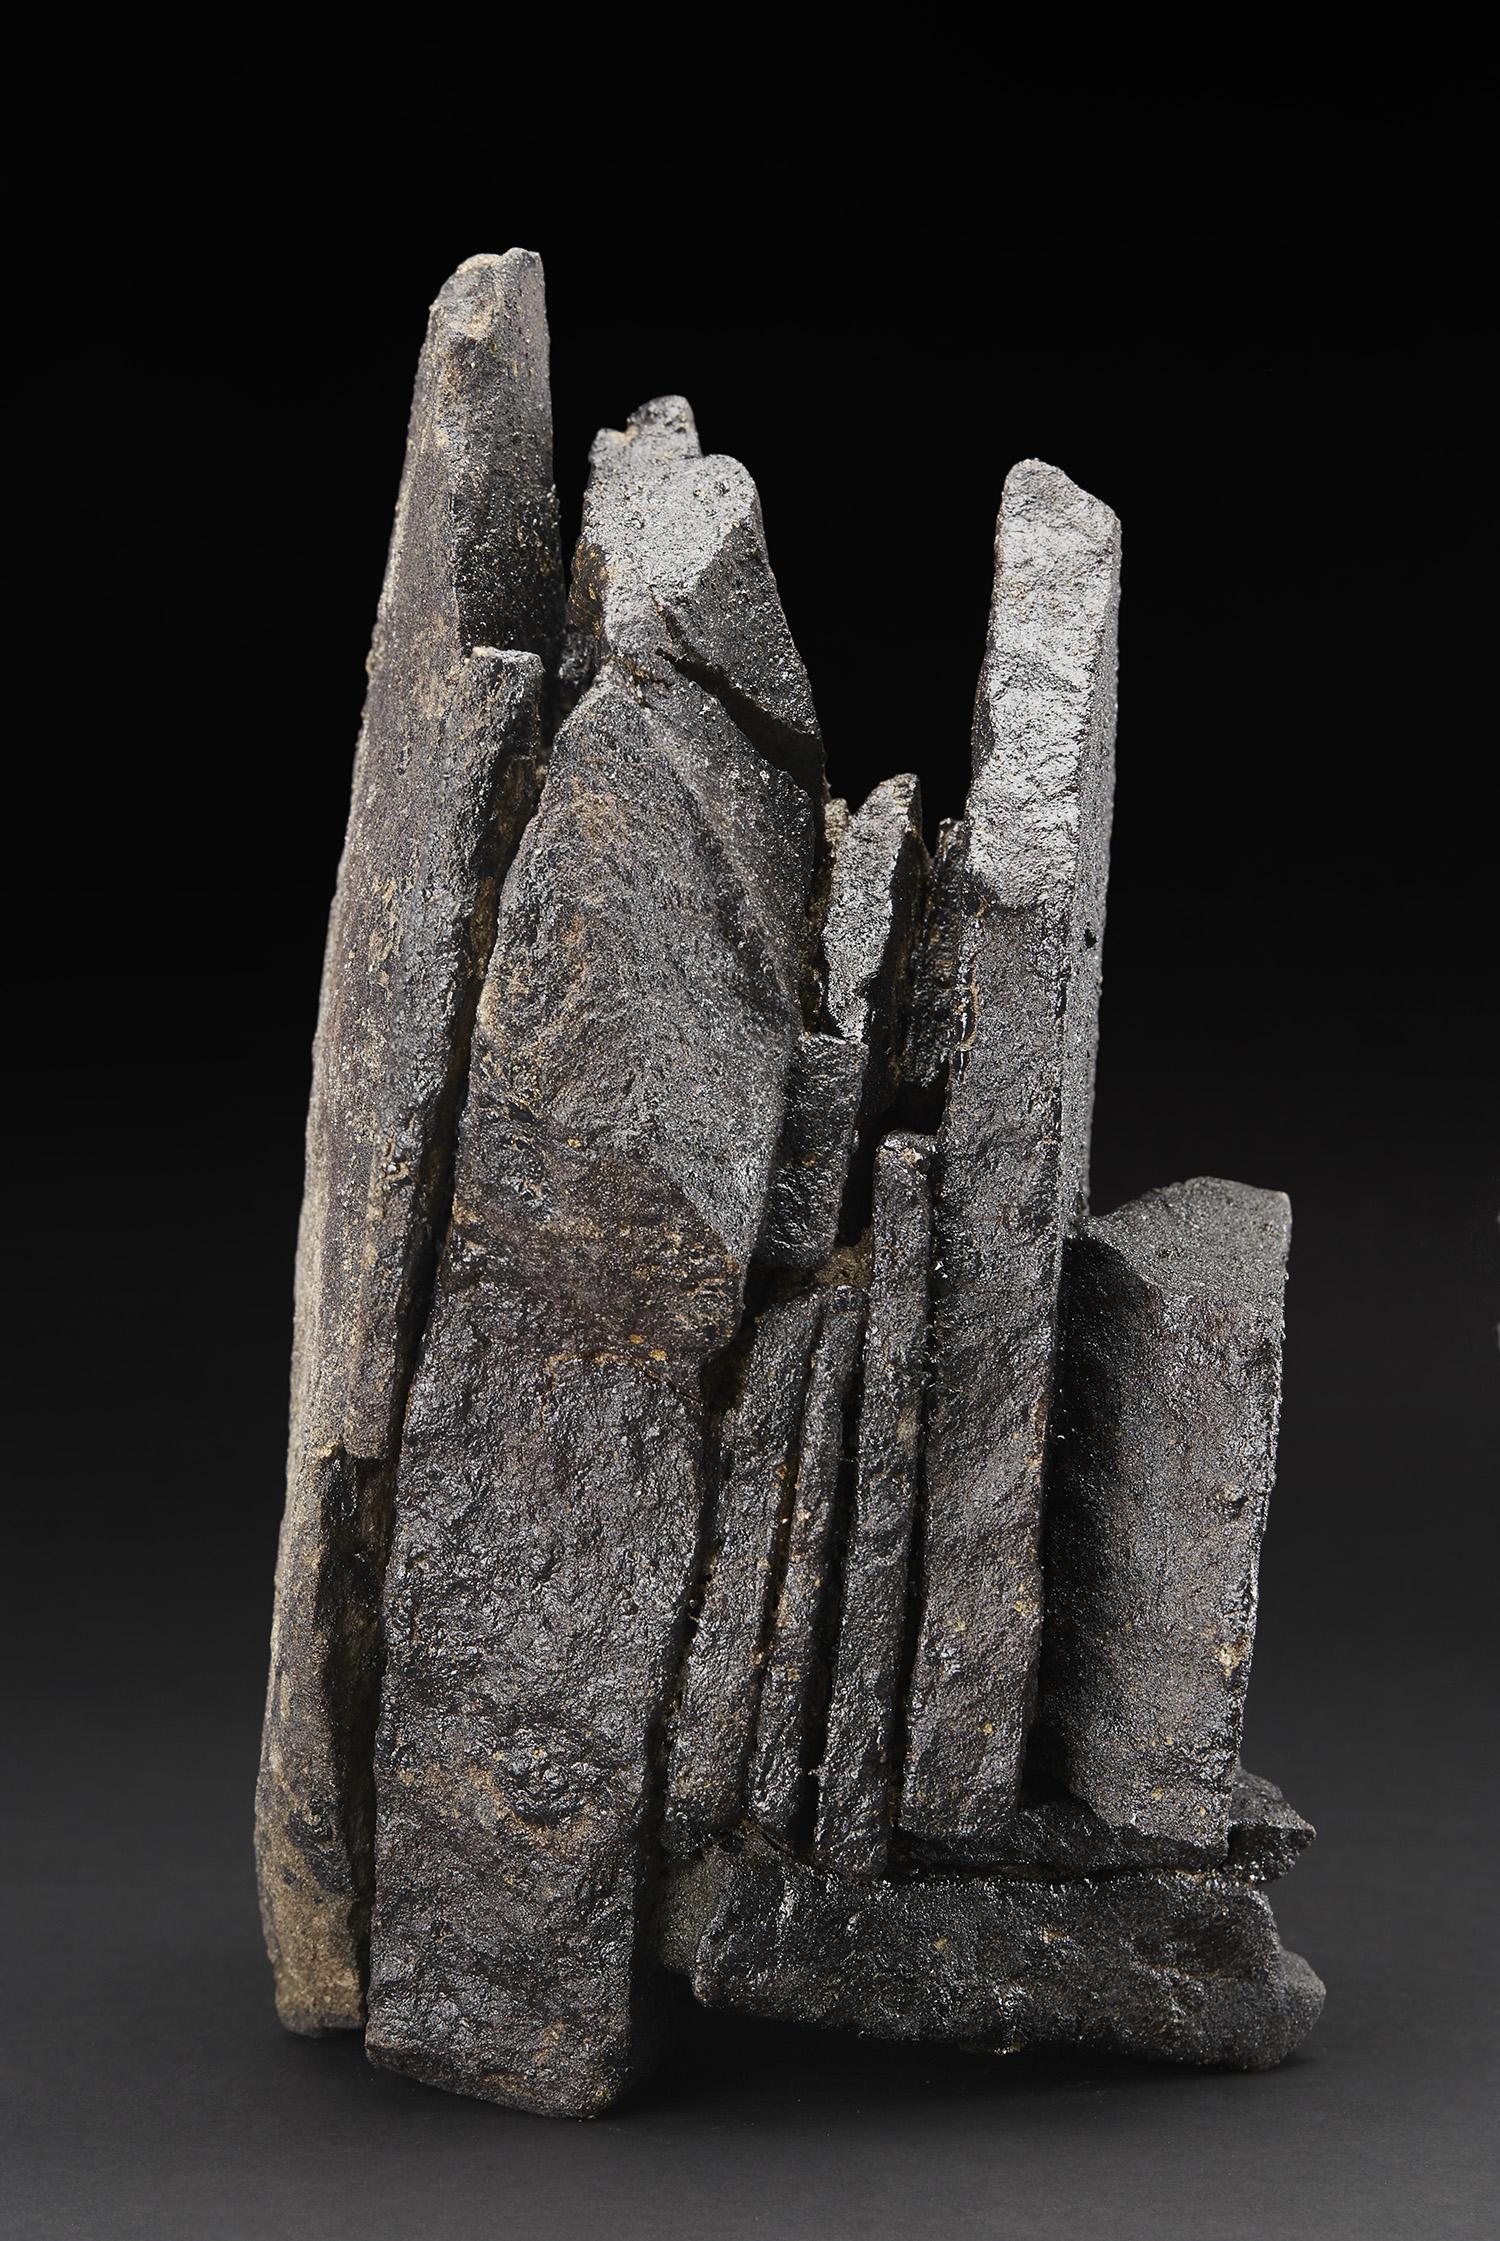 Mitch Iburg  Fond du Lac Formation 2  , 2018 Sandstone fragments, glacial clay, dolomite, limonite 13 x 7 x 9 inches| 33 x 17.8 x 22.9 cm Mib 31